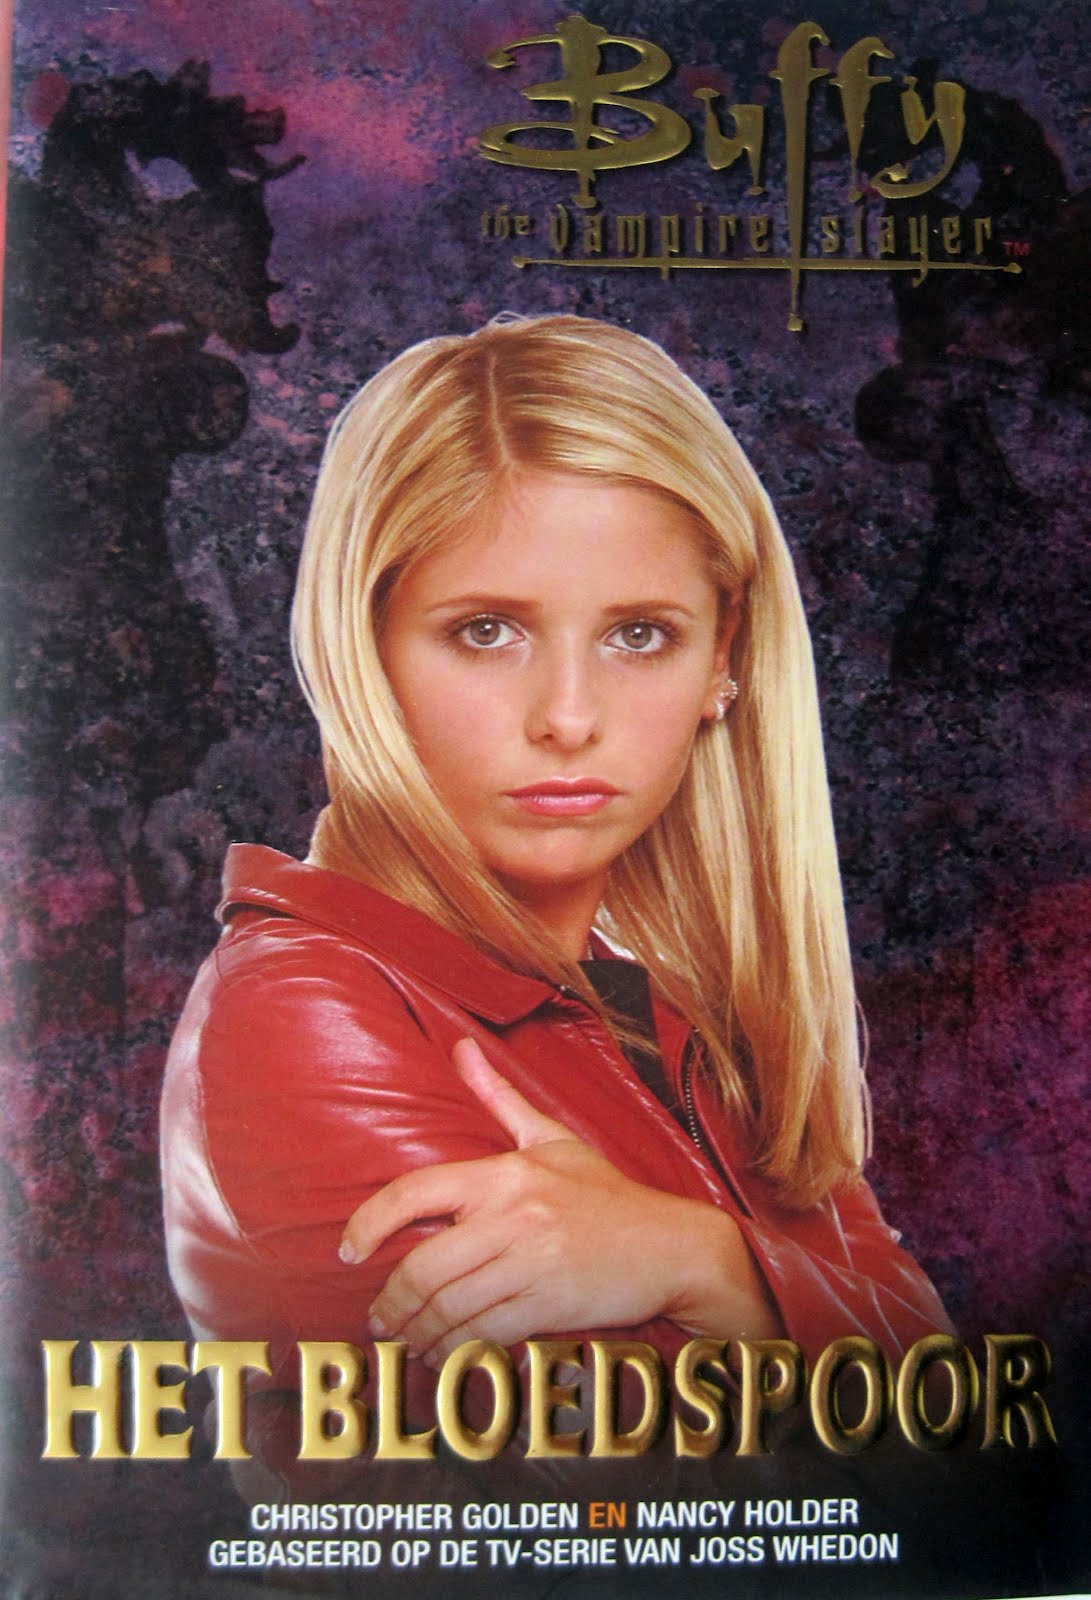 http://3.bp.blogspot.com/-mMknOPBcfqM/T0IfsIBWf7I/AAAAAAAALRk/n5VJztowYlQ/s1600/Buffy%2Bbloedspoor%2Bboek1998.jpg